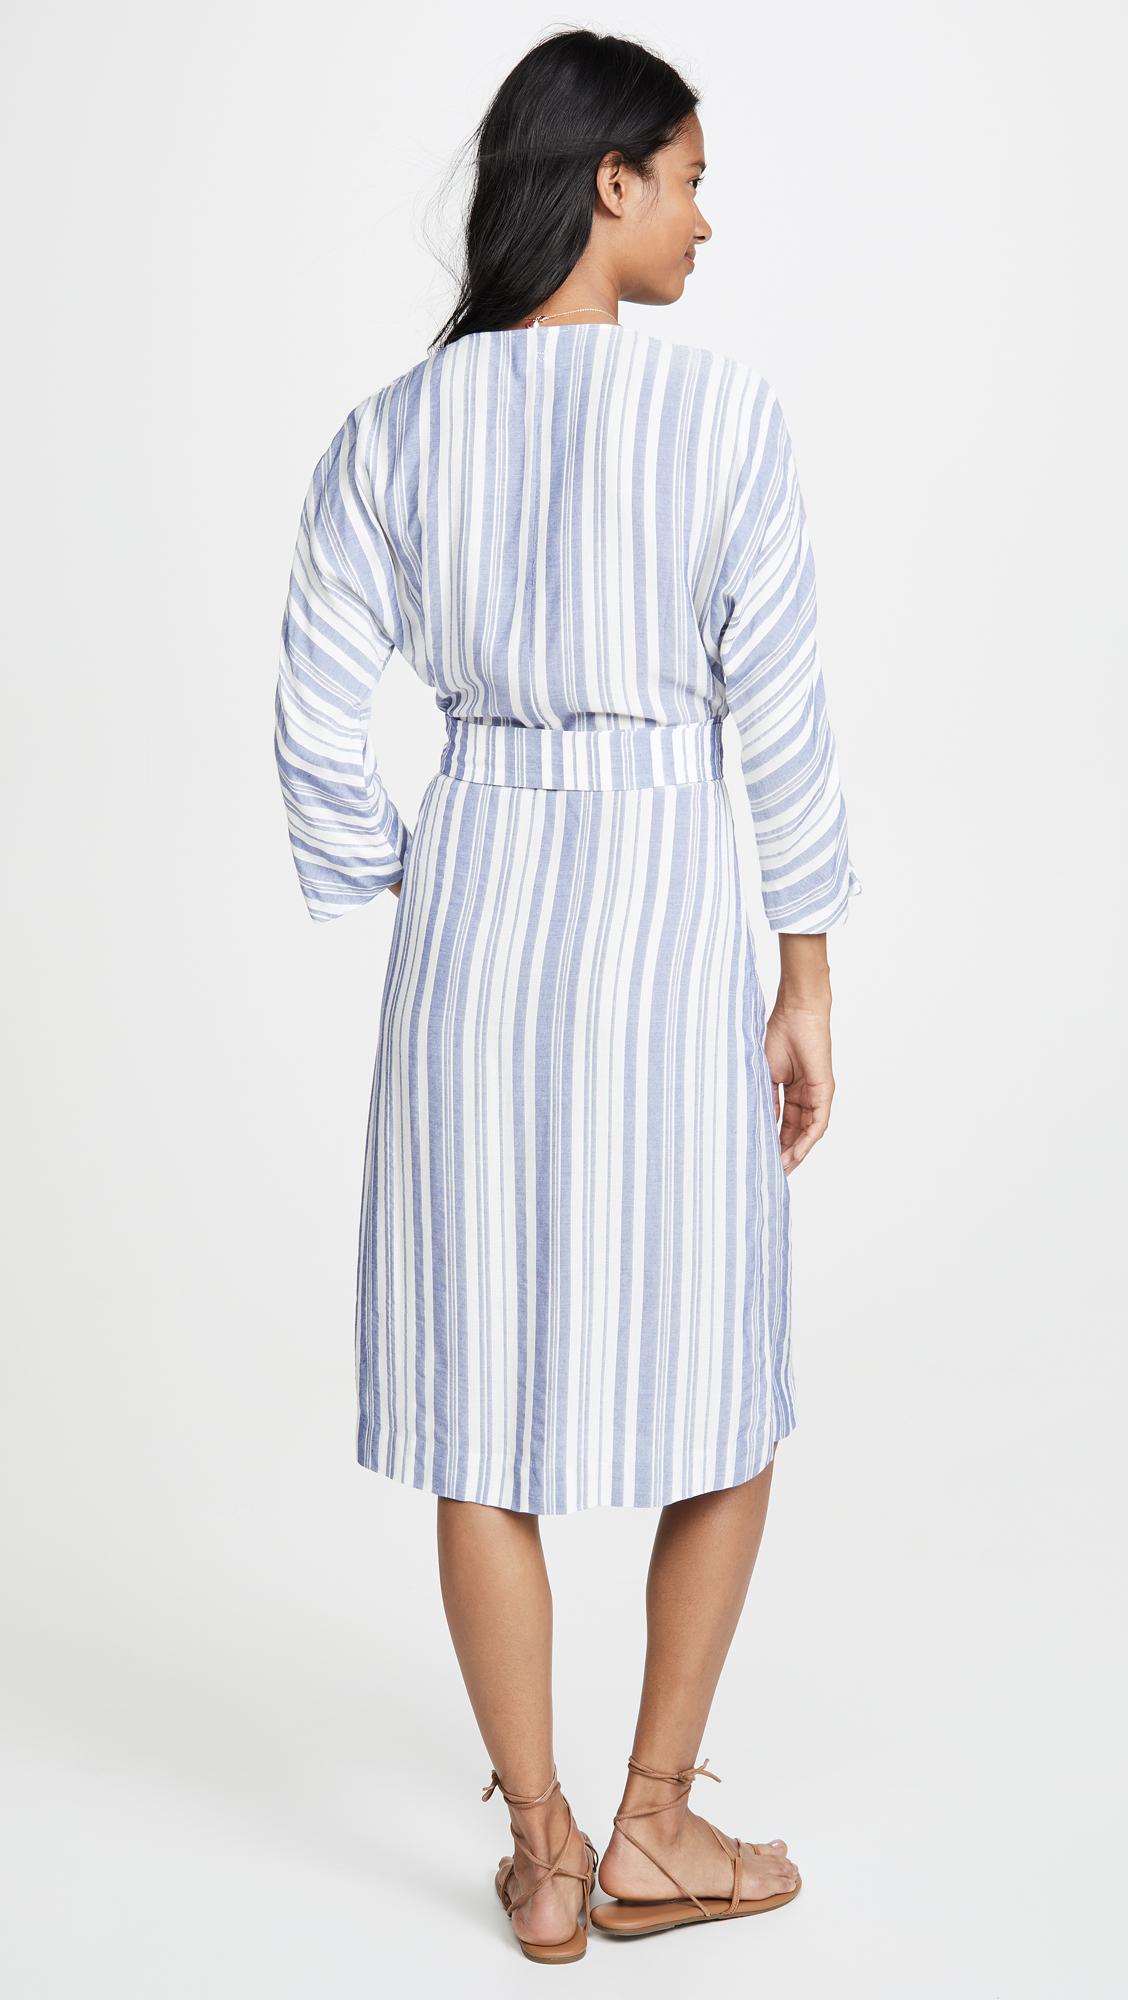 bcc94c6ecece Heartmade Hirsa Dress